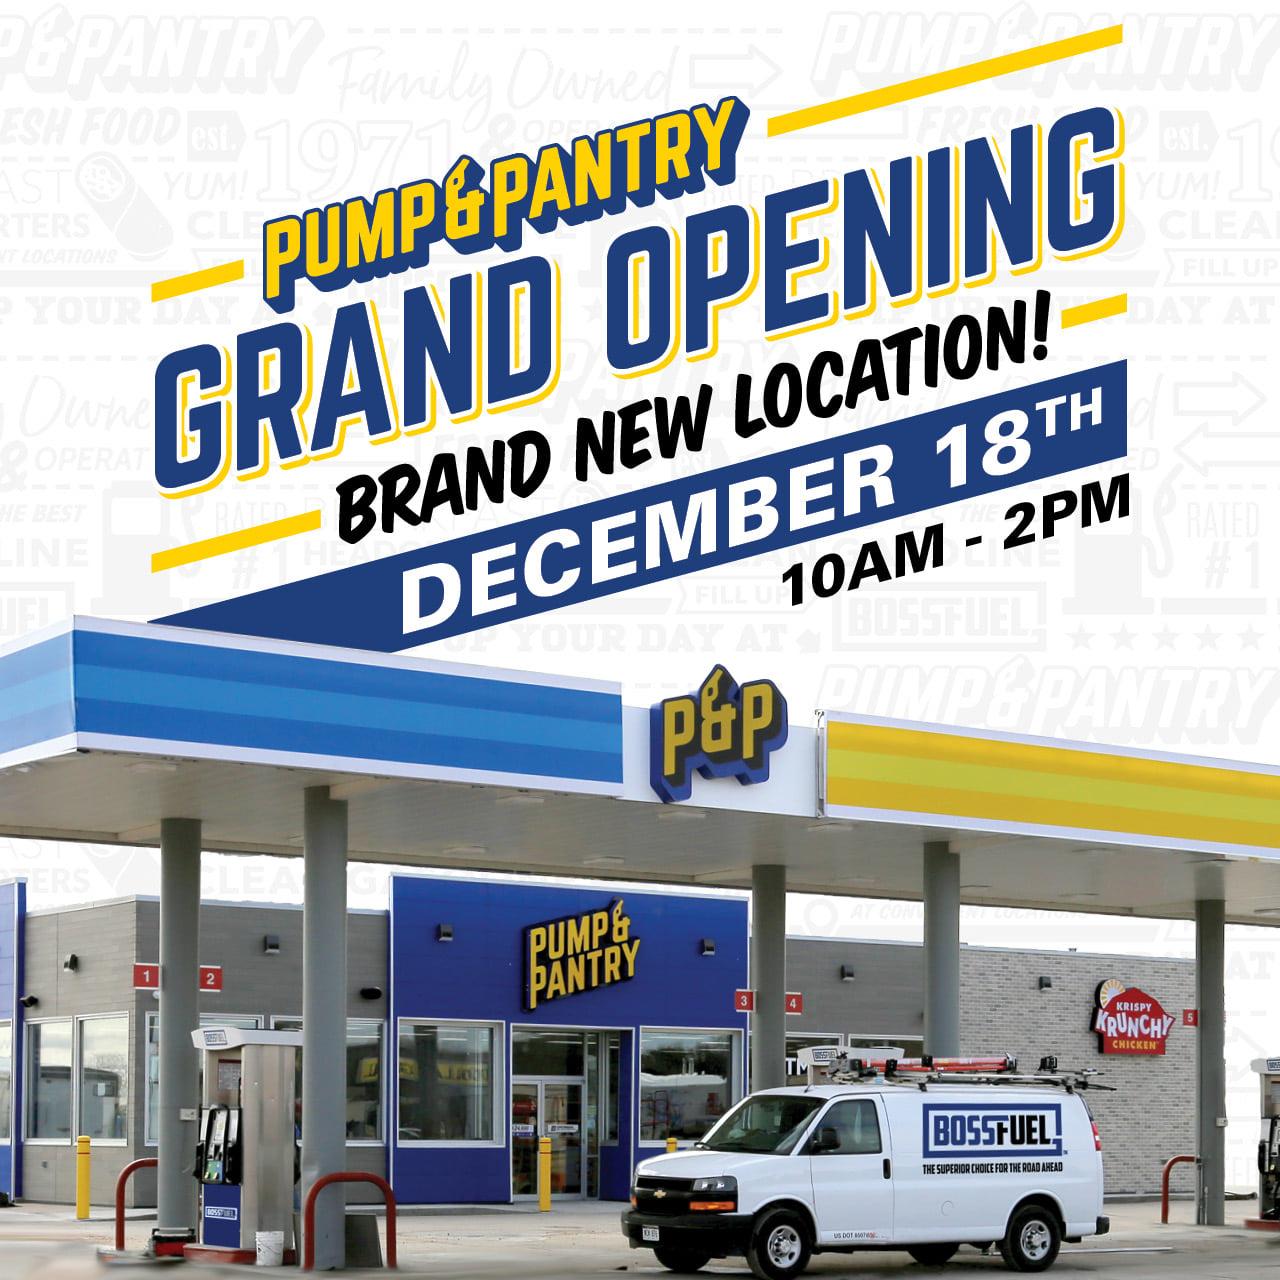 Pump & Pantry 306 E 1st St, Ogallala